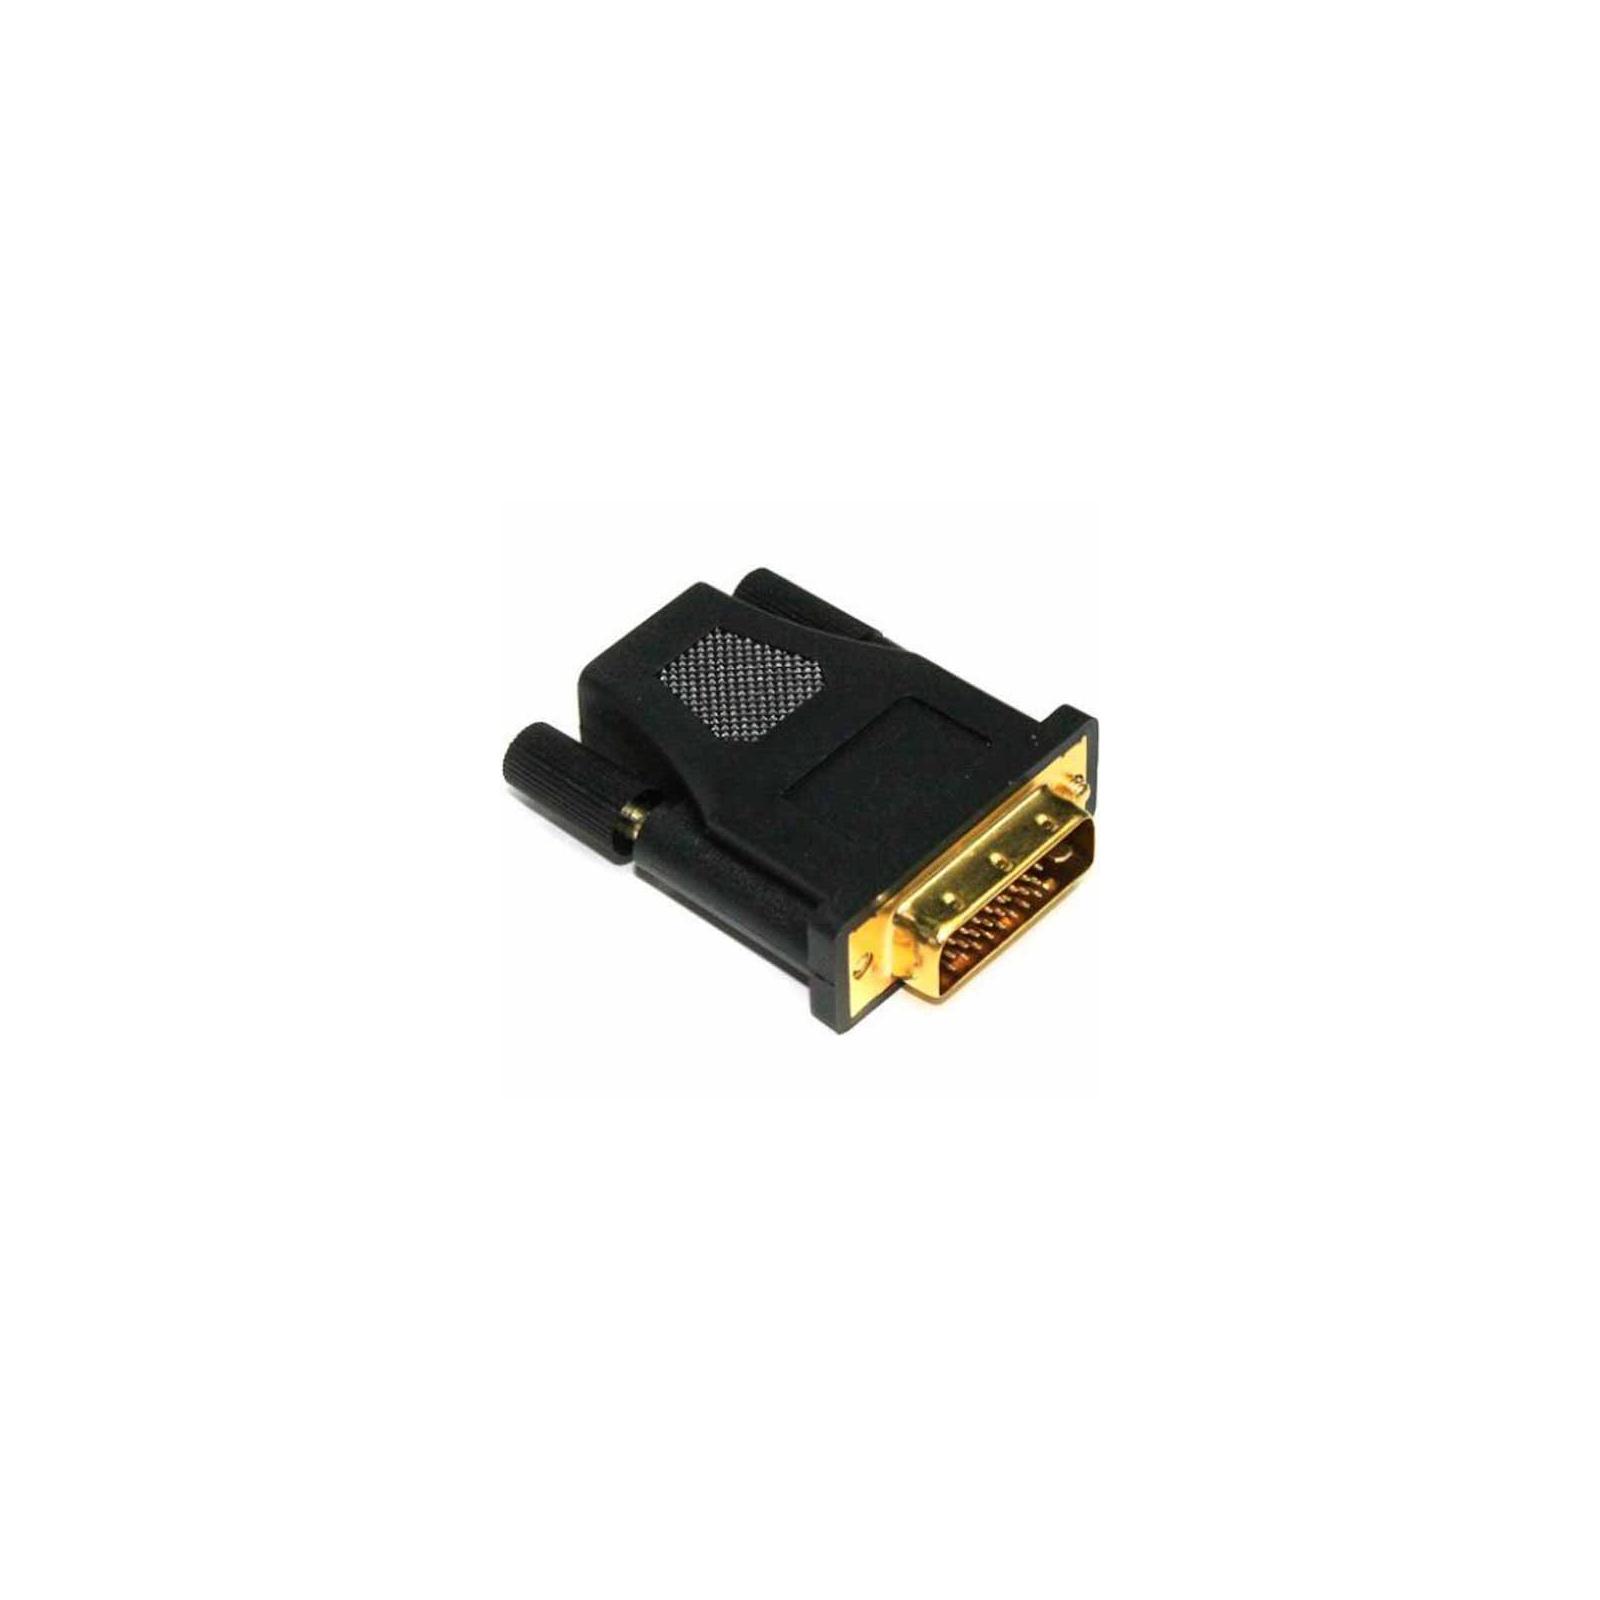 Переходник HDMI AF to DVI M (24+1) Viewcon (VD 037 B)